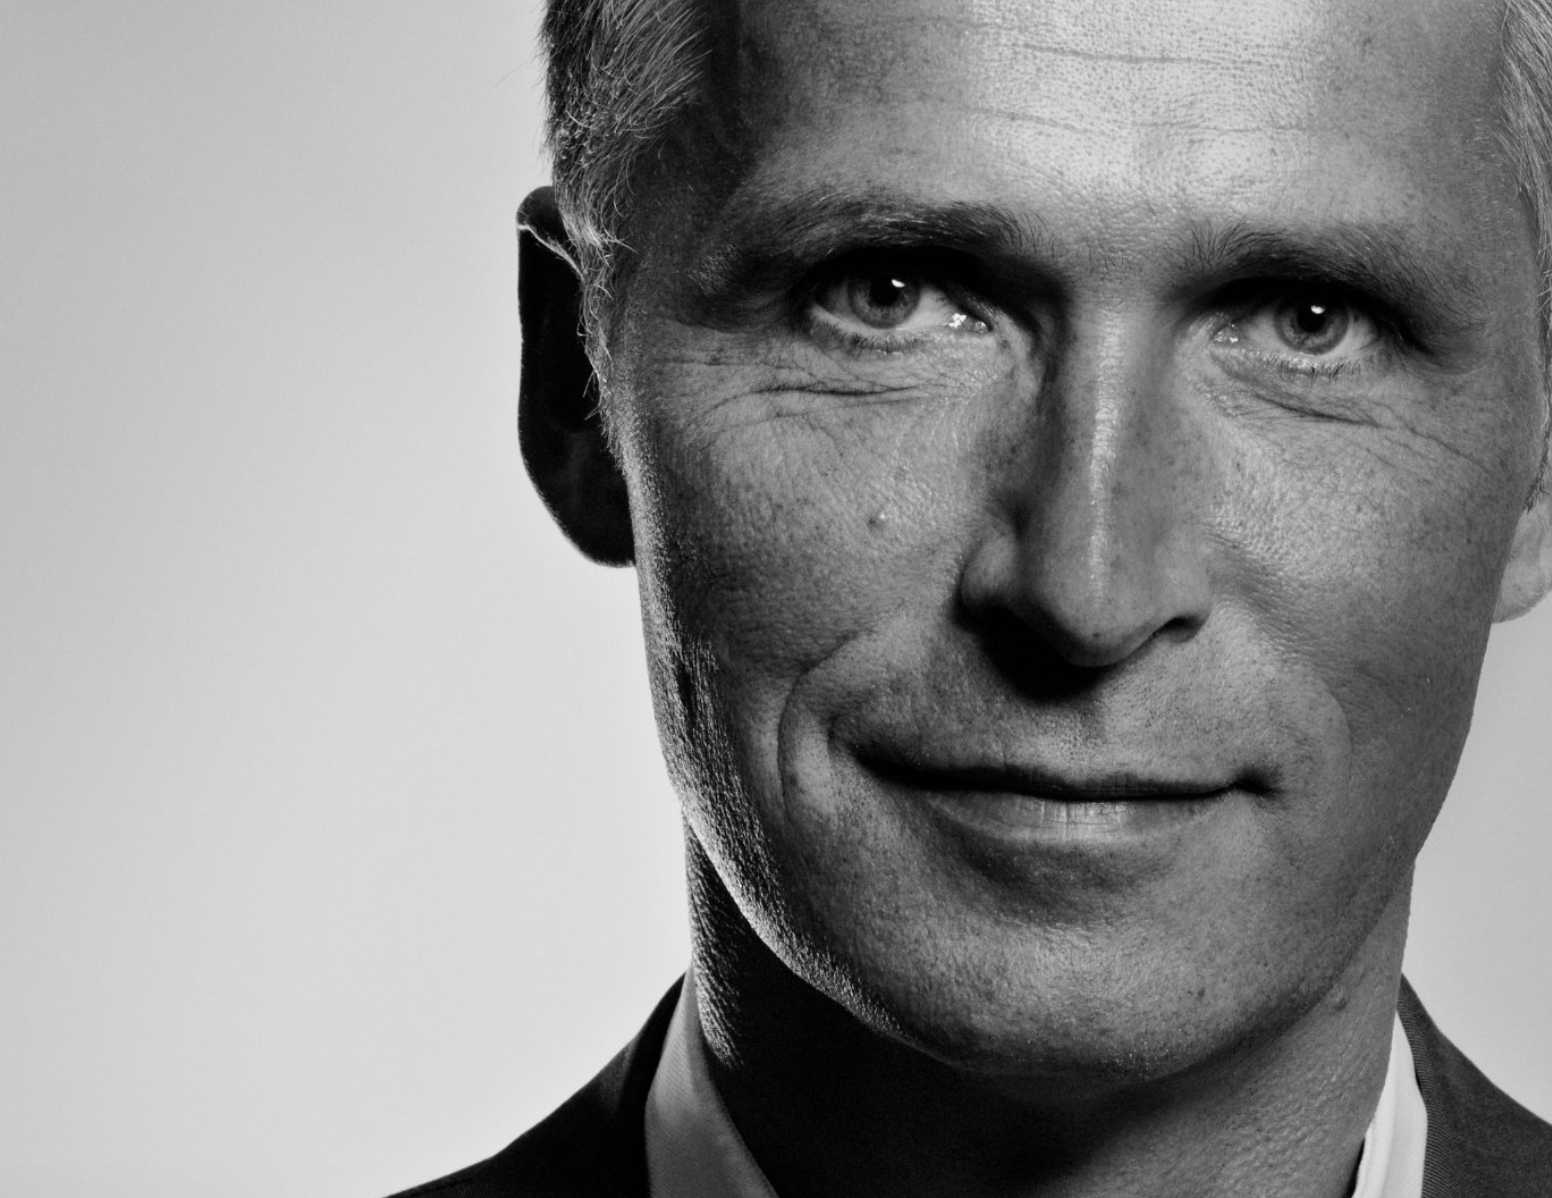 Jens Stoltenberg - The Secretary General of NATO